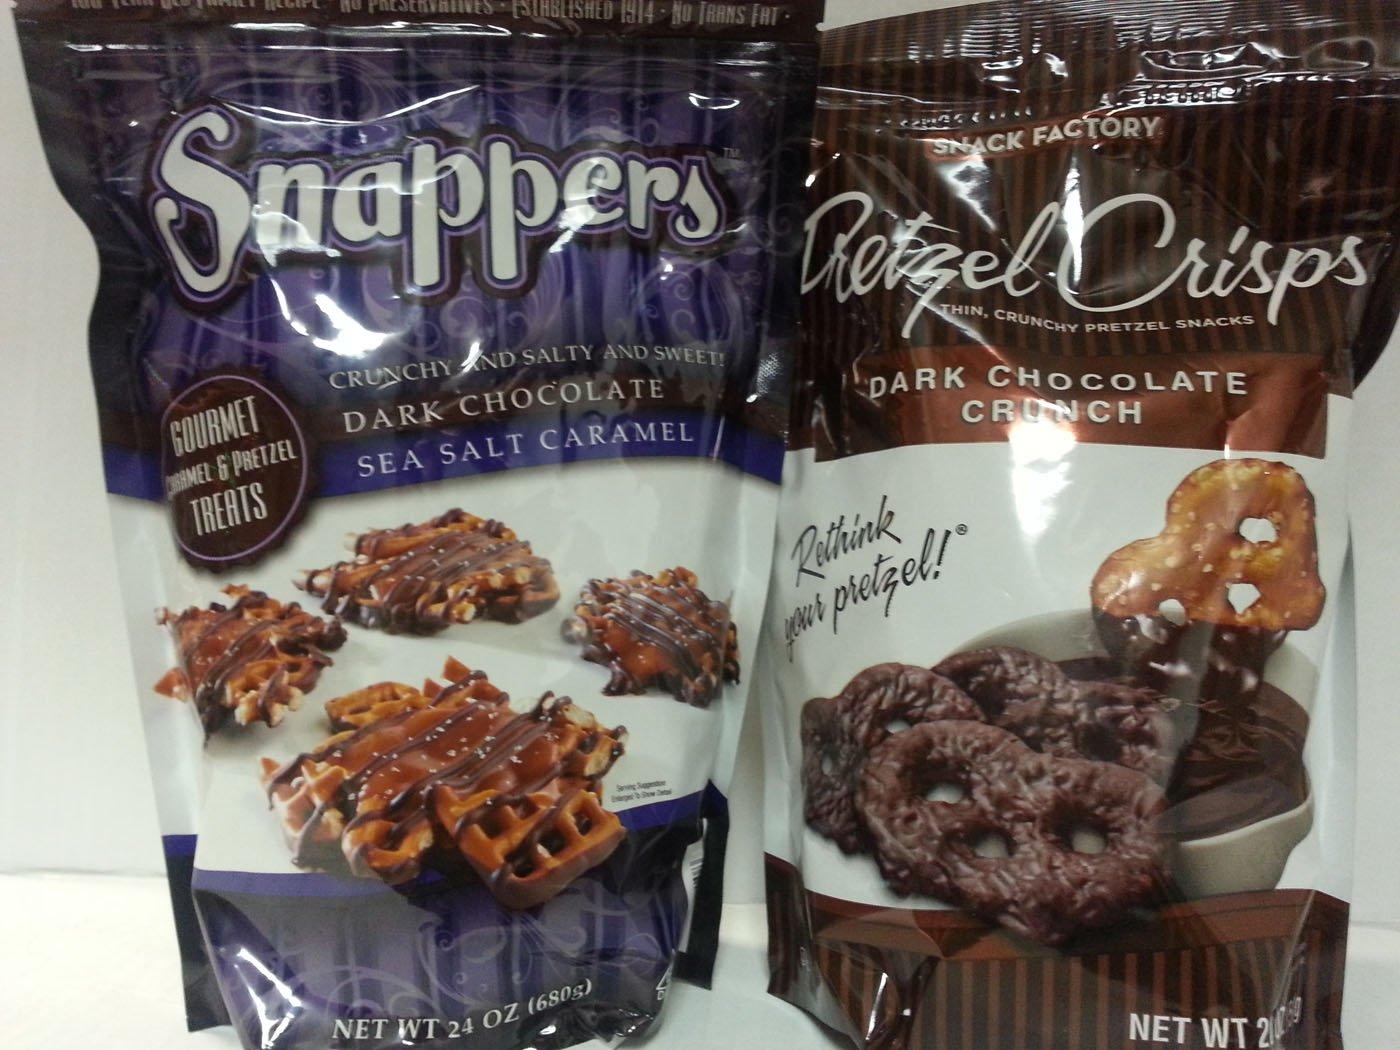 Amazon.com : Snappers Dark Chocolate Sea Salt Caramel Gourmet ...